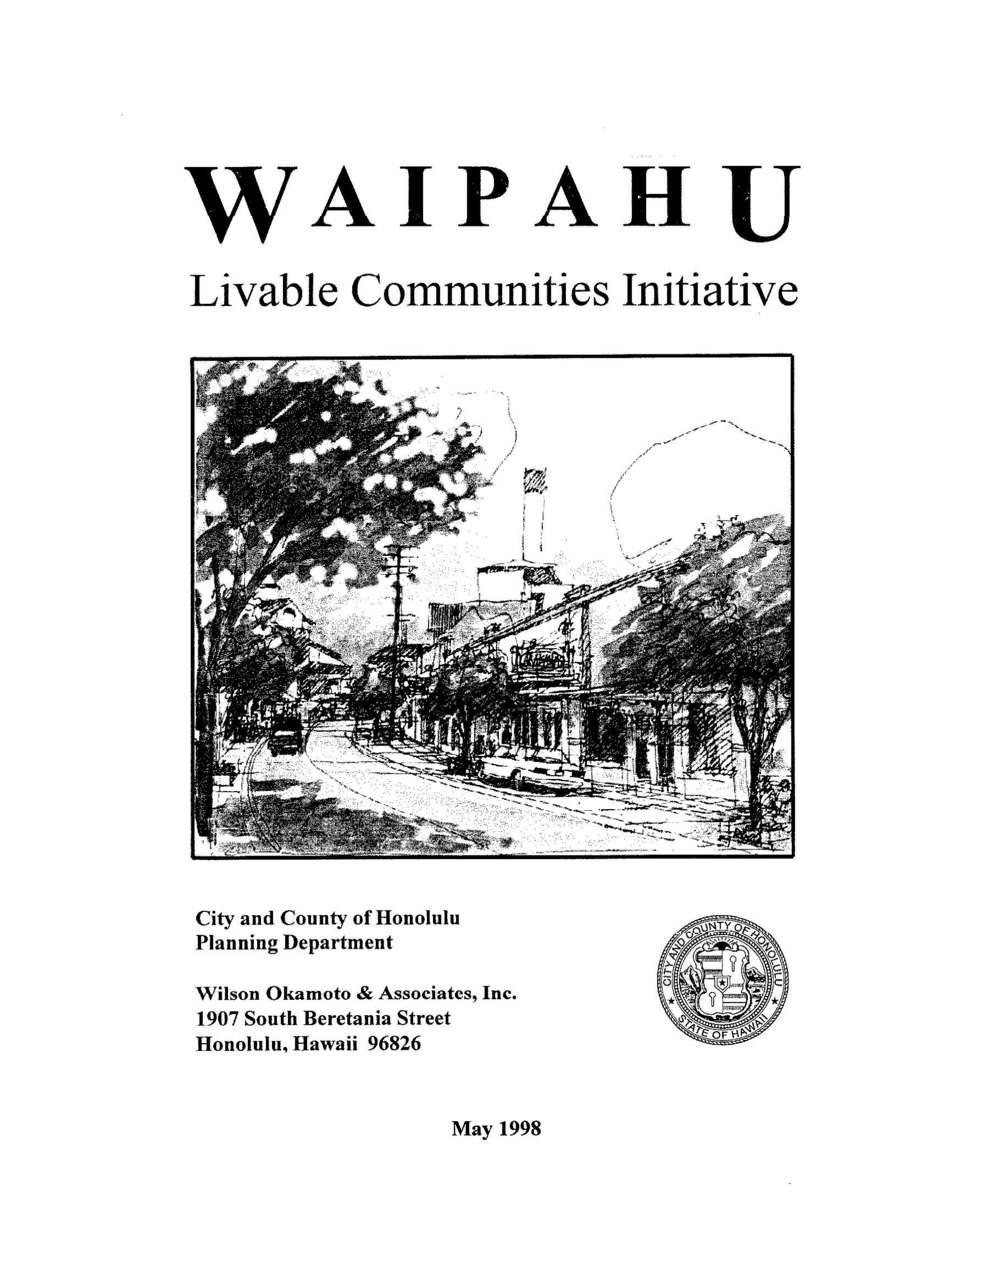 160531_WaipahuLivableCommunities(1998)_Page_001.jpg